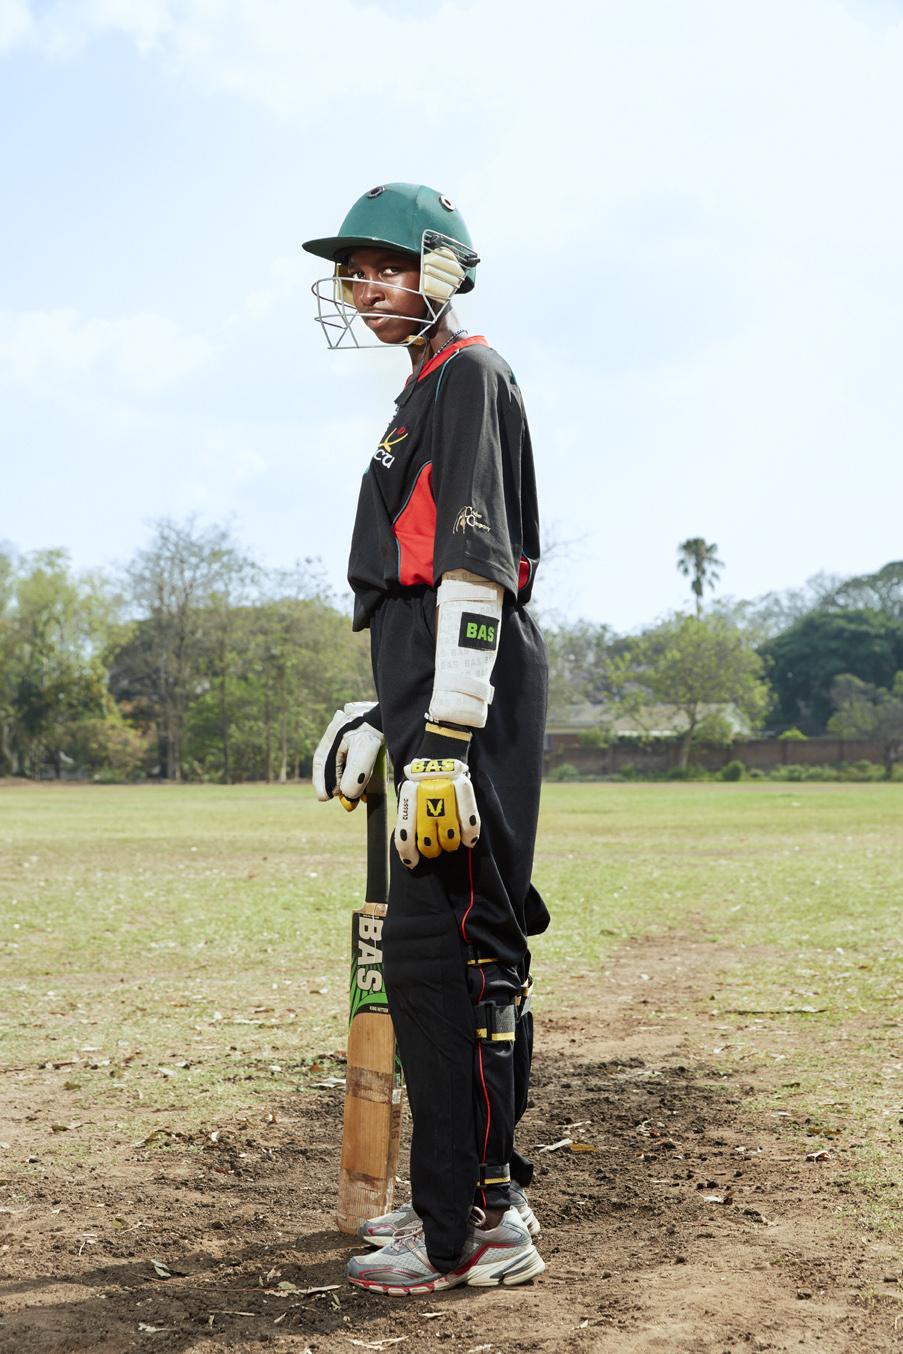 Dalida Dzimau, batsman